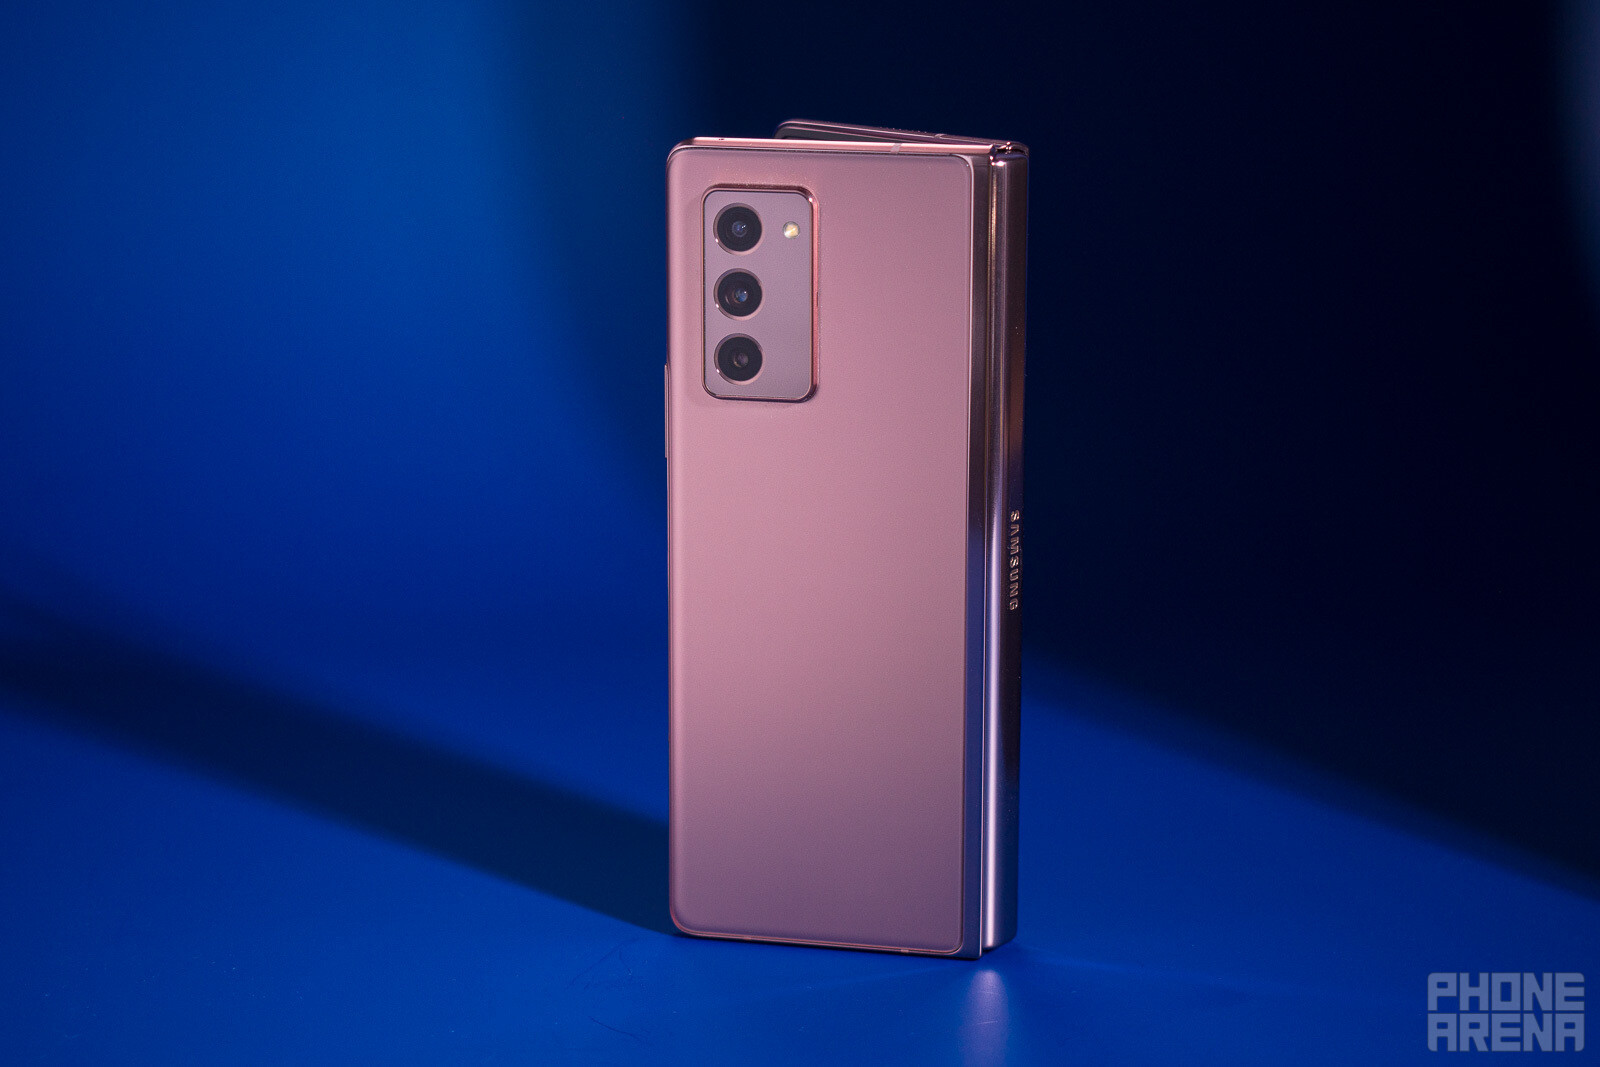 Samsung-Galaxy-Z-Fold-2-Review005.jpg